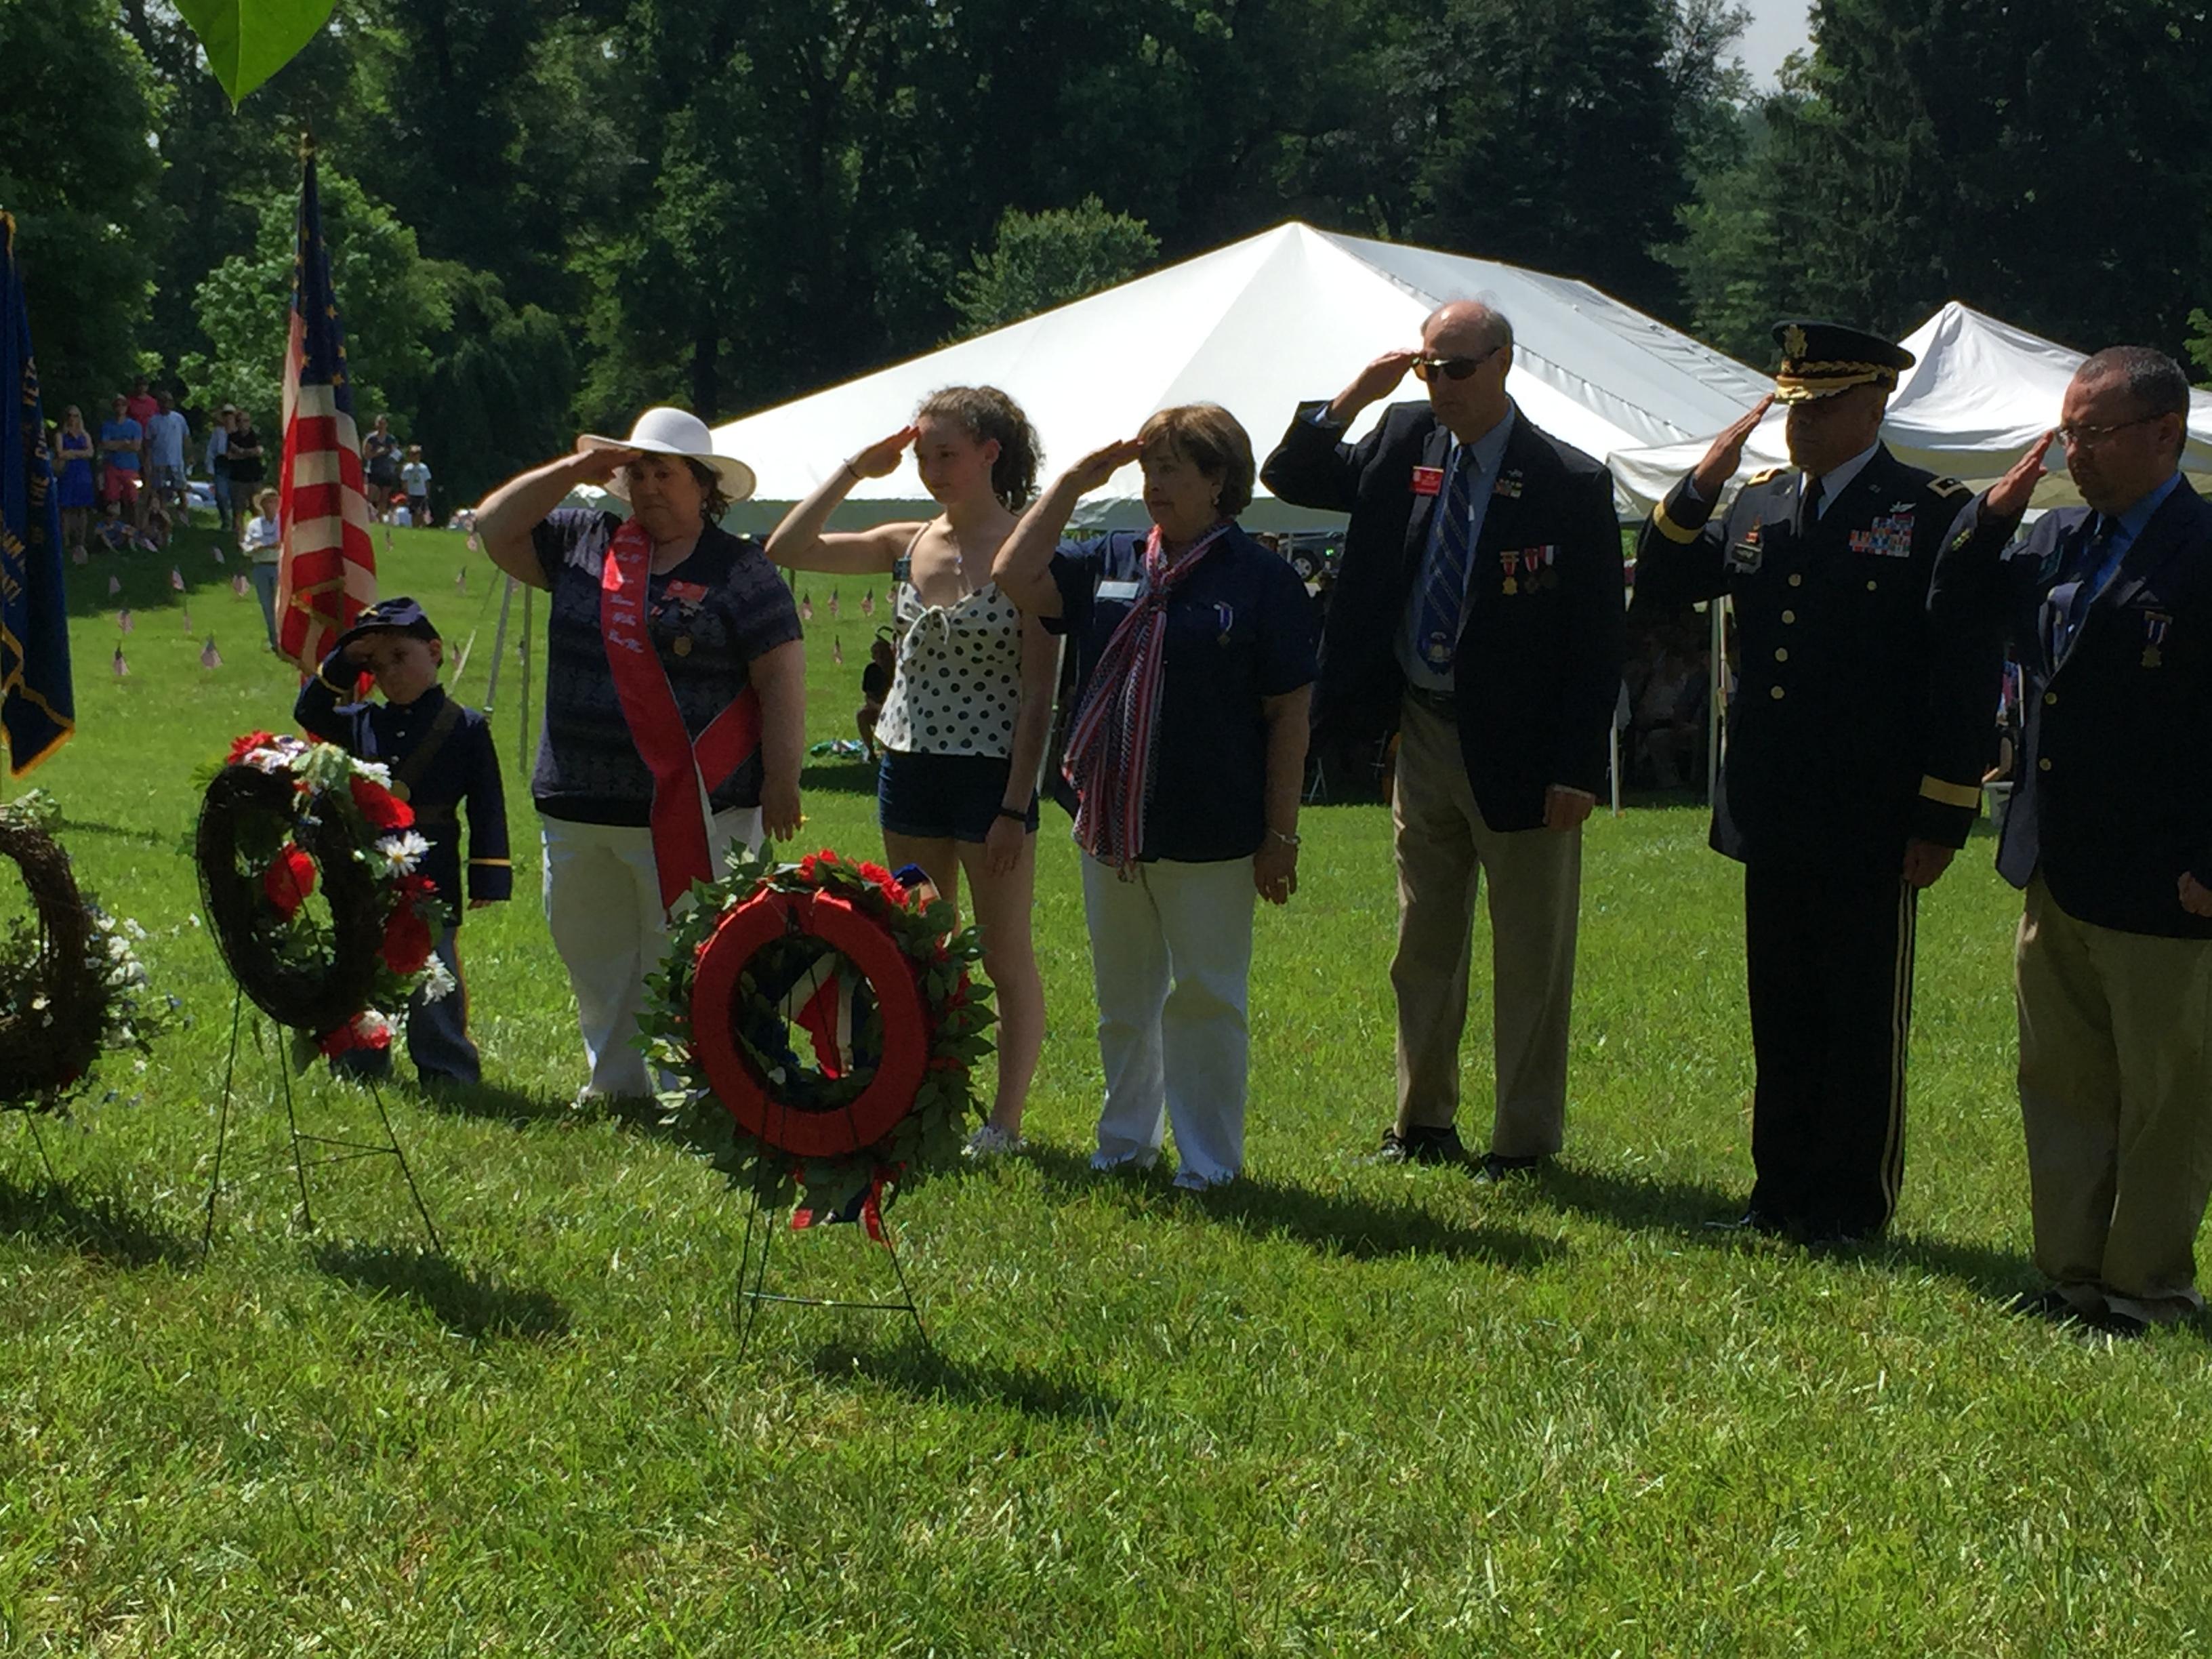 2018.05.28 SUV Memorial Day, Spring Grove Cemetery, Cincinnati 030